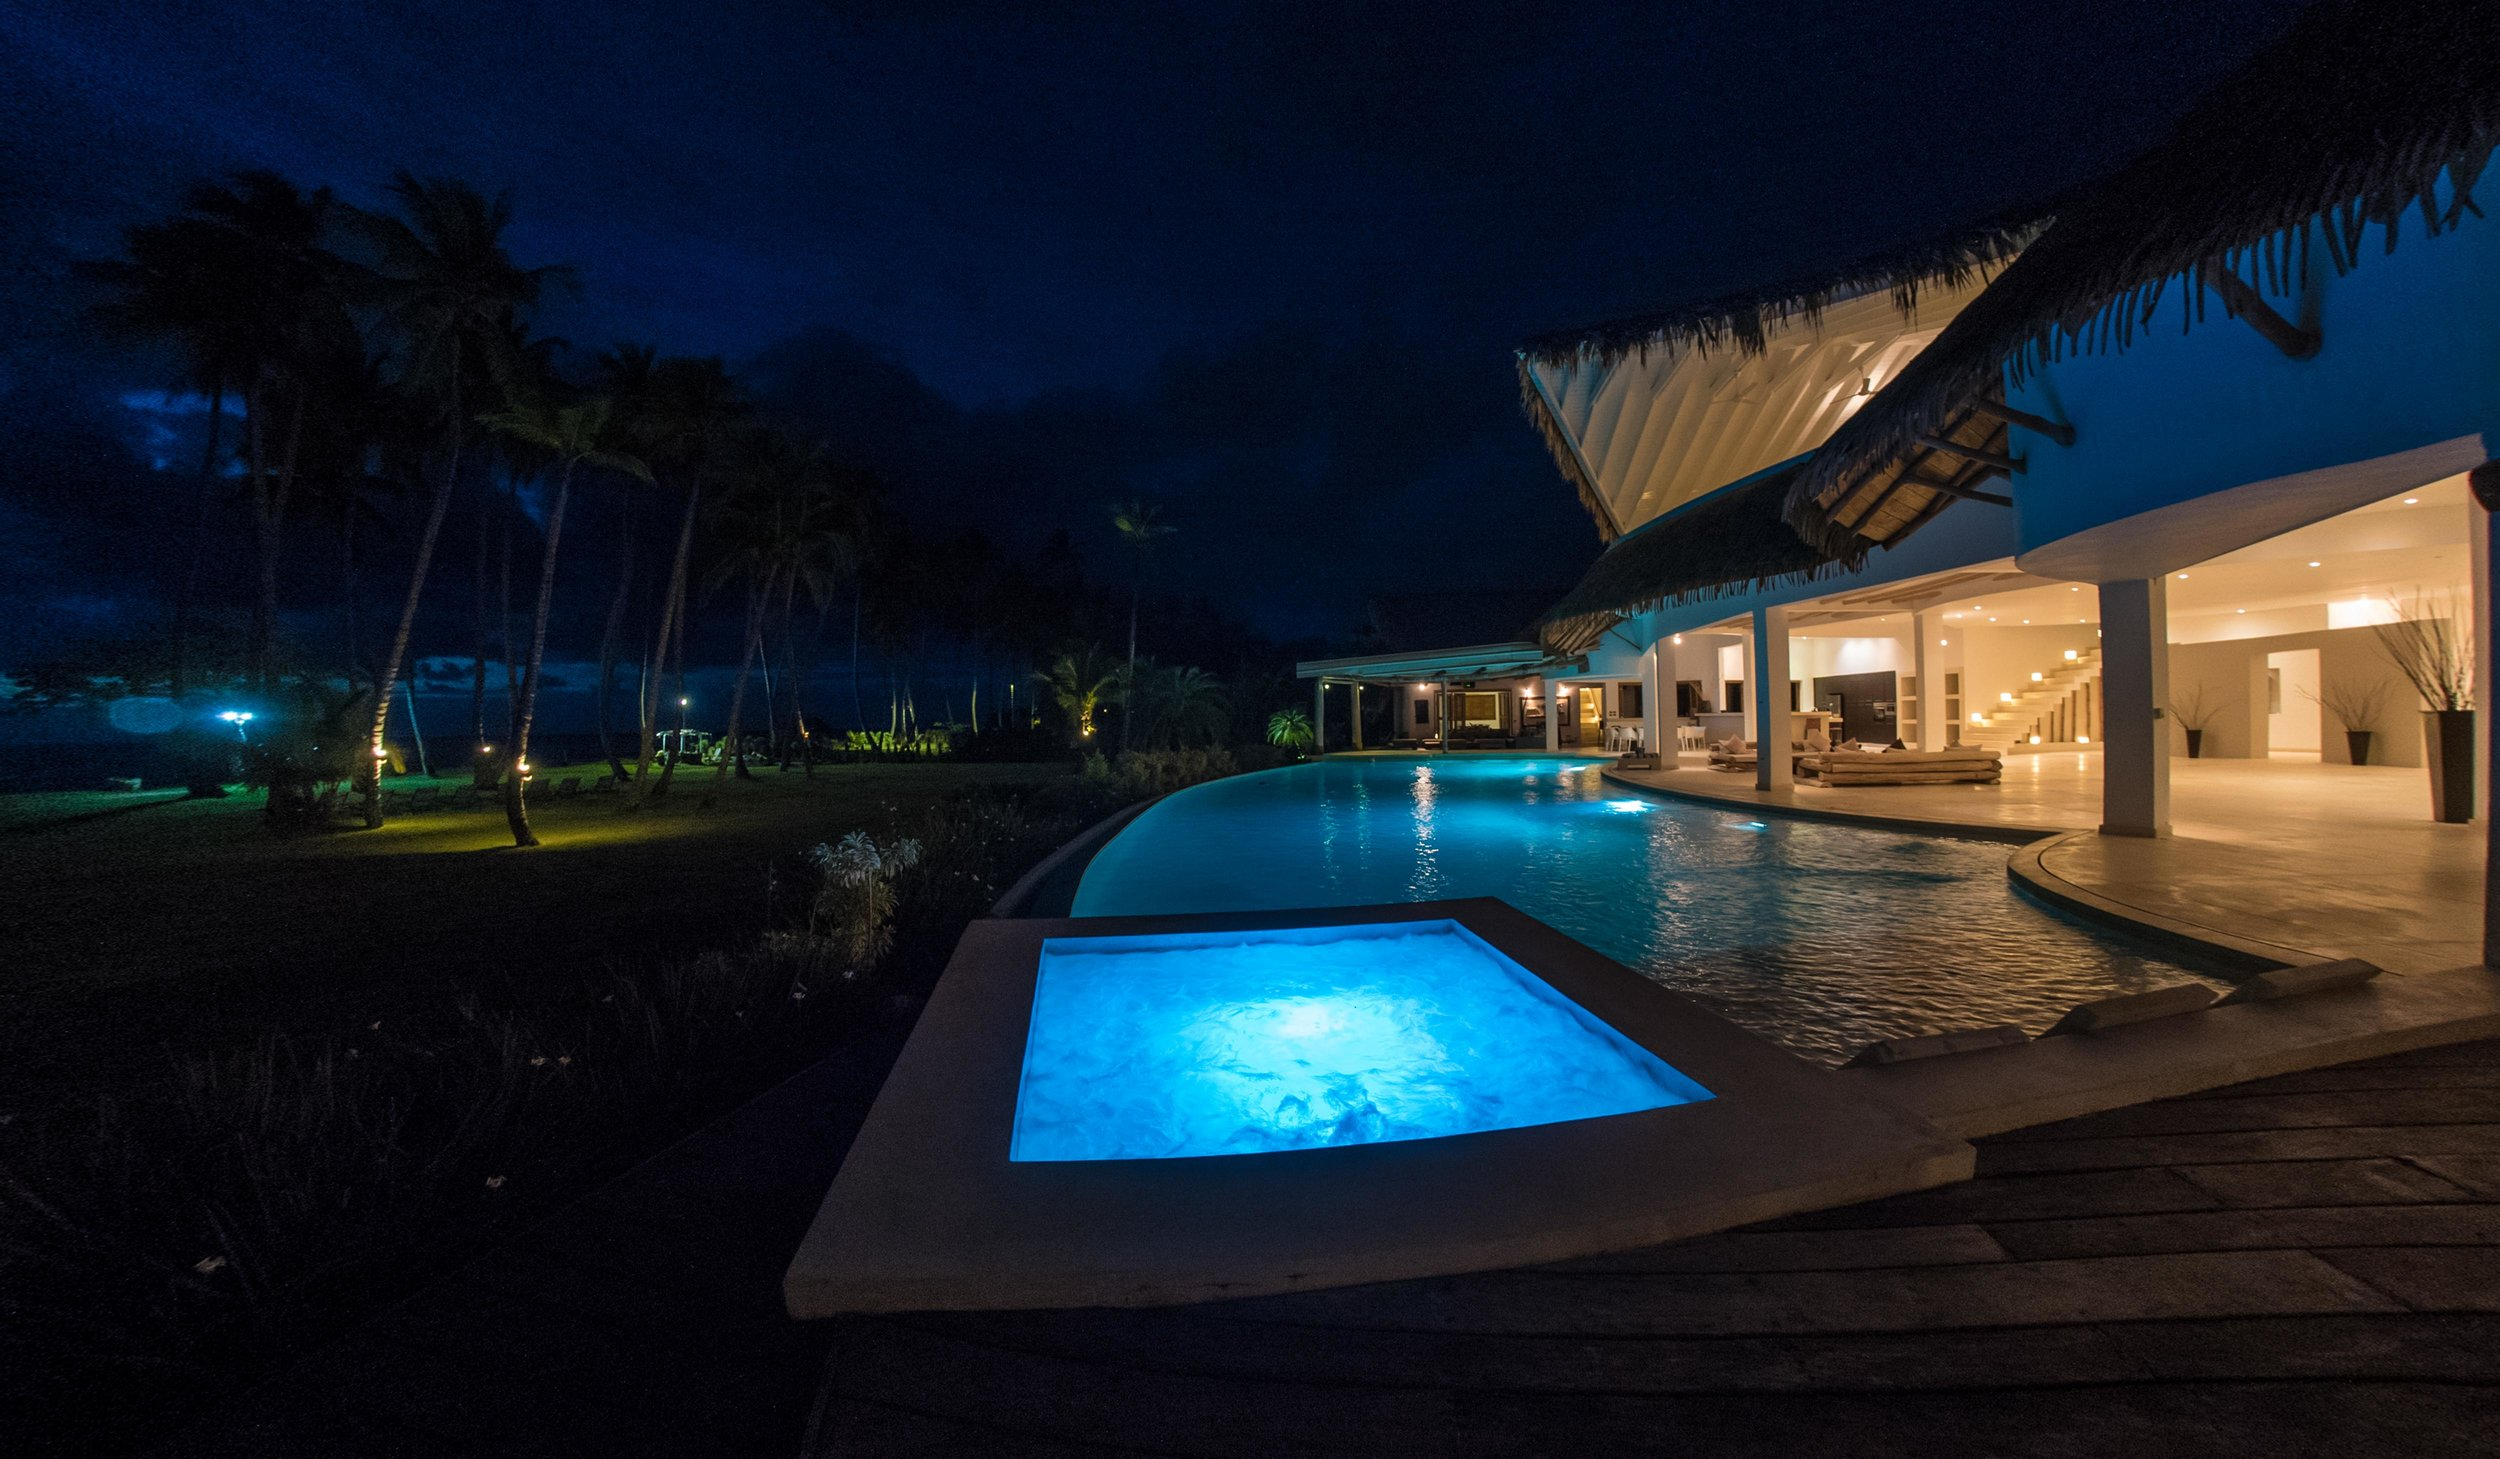 Villa for Sale Las Terrenas Pool by night.jpg